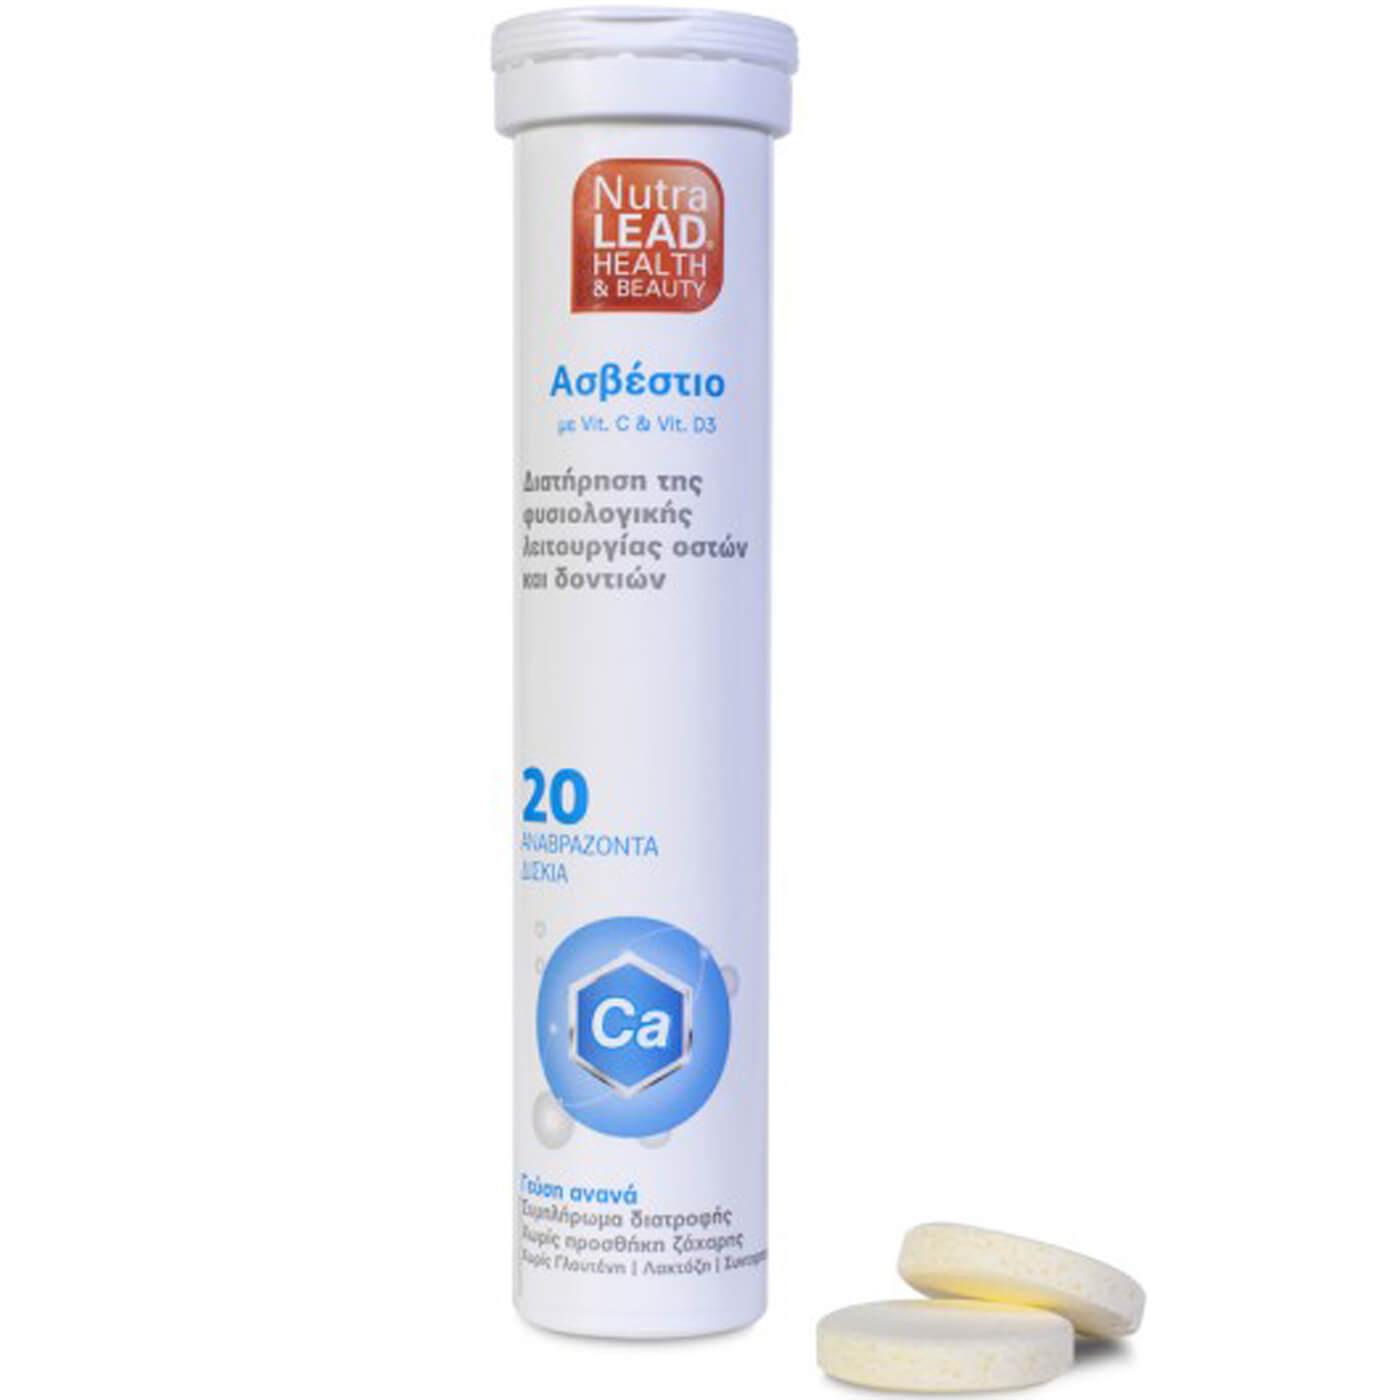 Nutralead Ασβέστιο με Βιταμίνη C & D3 Συμπλήρωμα Διατροφής, Διατήρηση της Φυσιολογικής Λειτουργίας Οστών & Δοντιών 20Effer.Tabs